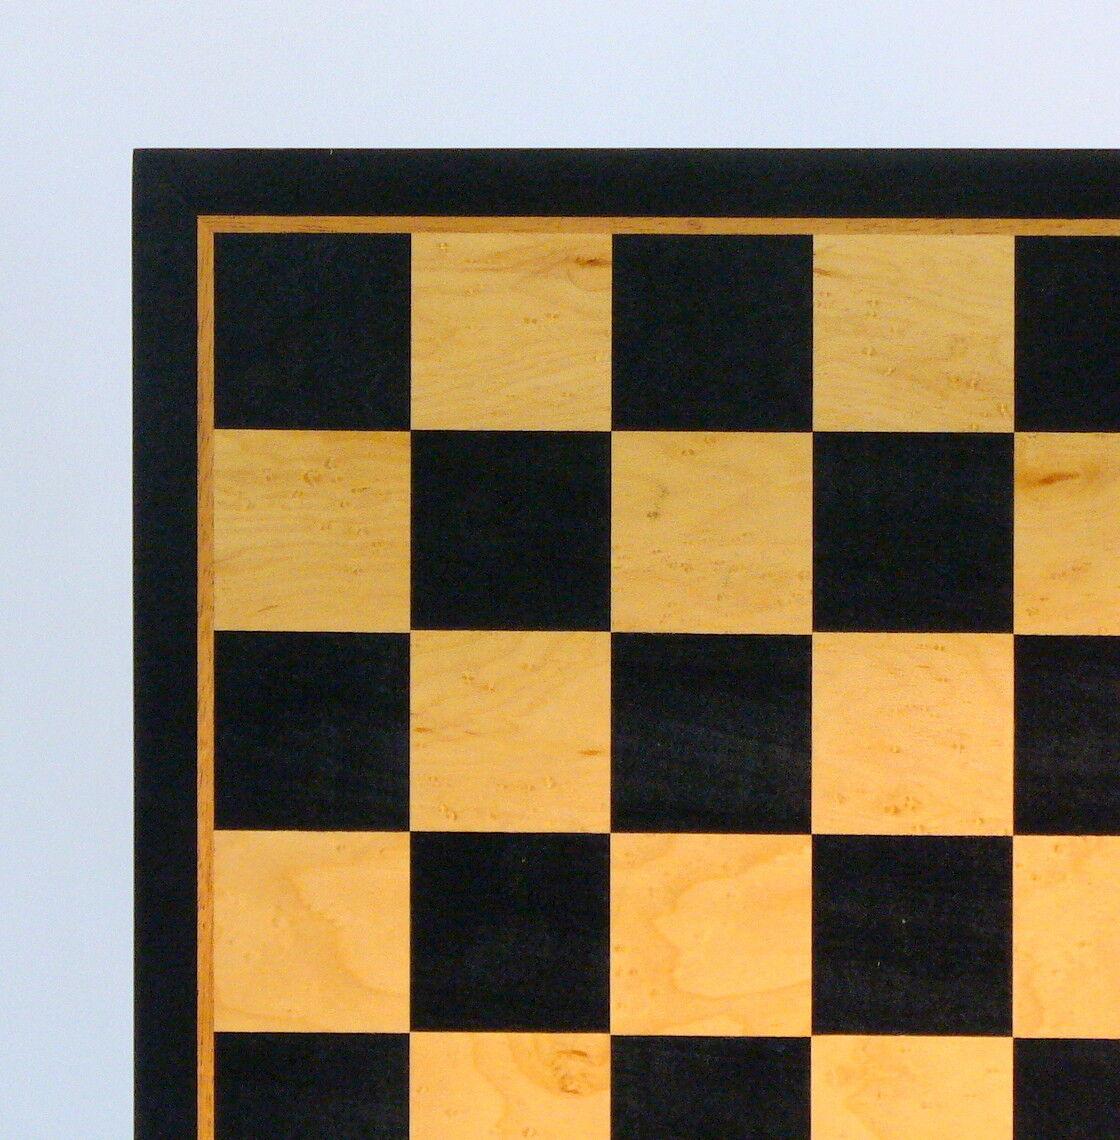 CHESSBOARD - 21  - 2¼  SQ's - BIRDSEYE MAPLE INLAID WOOD (ww 55520bbm)